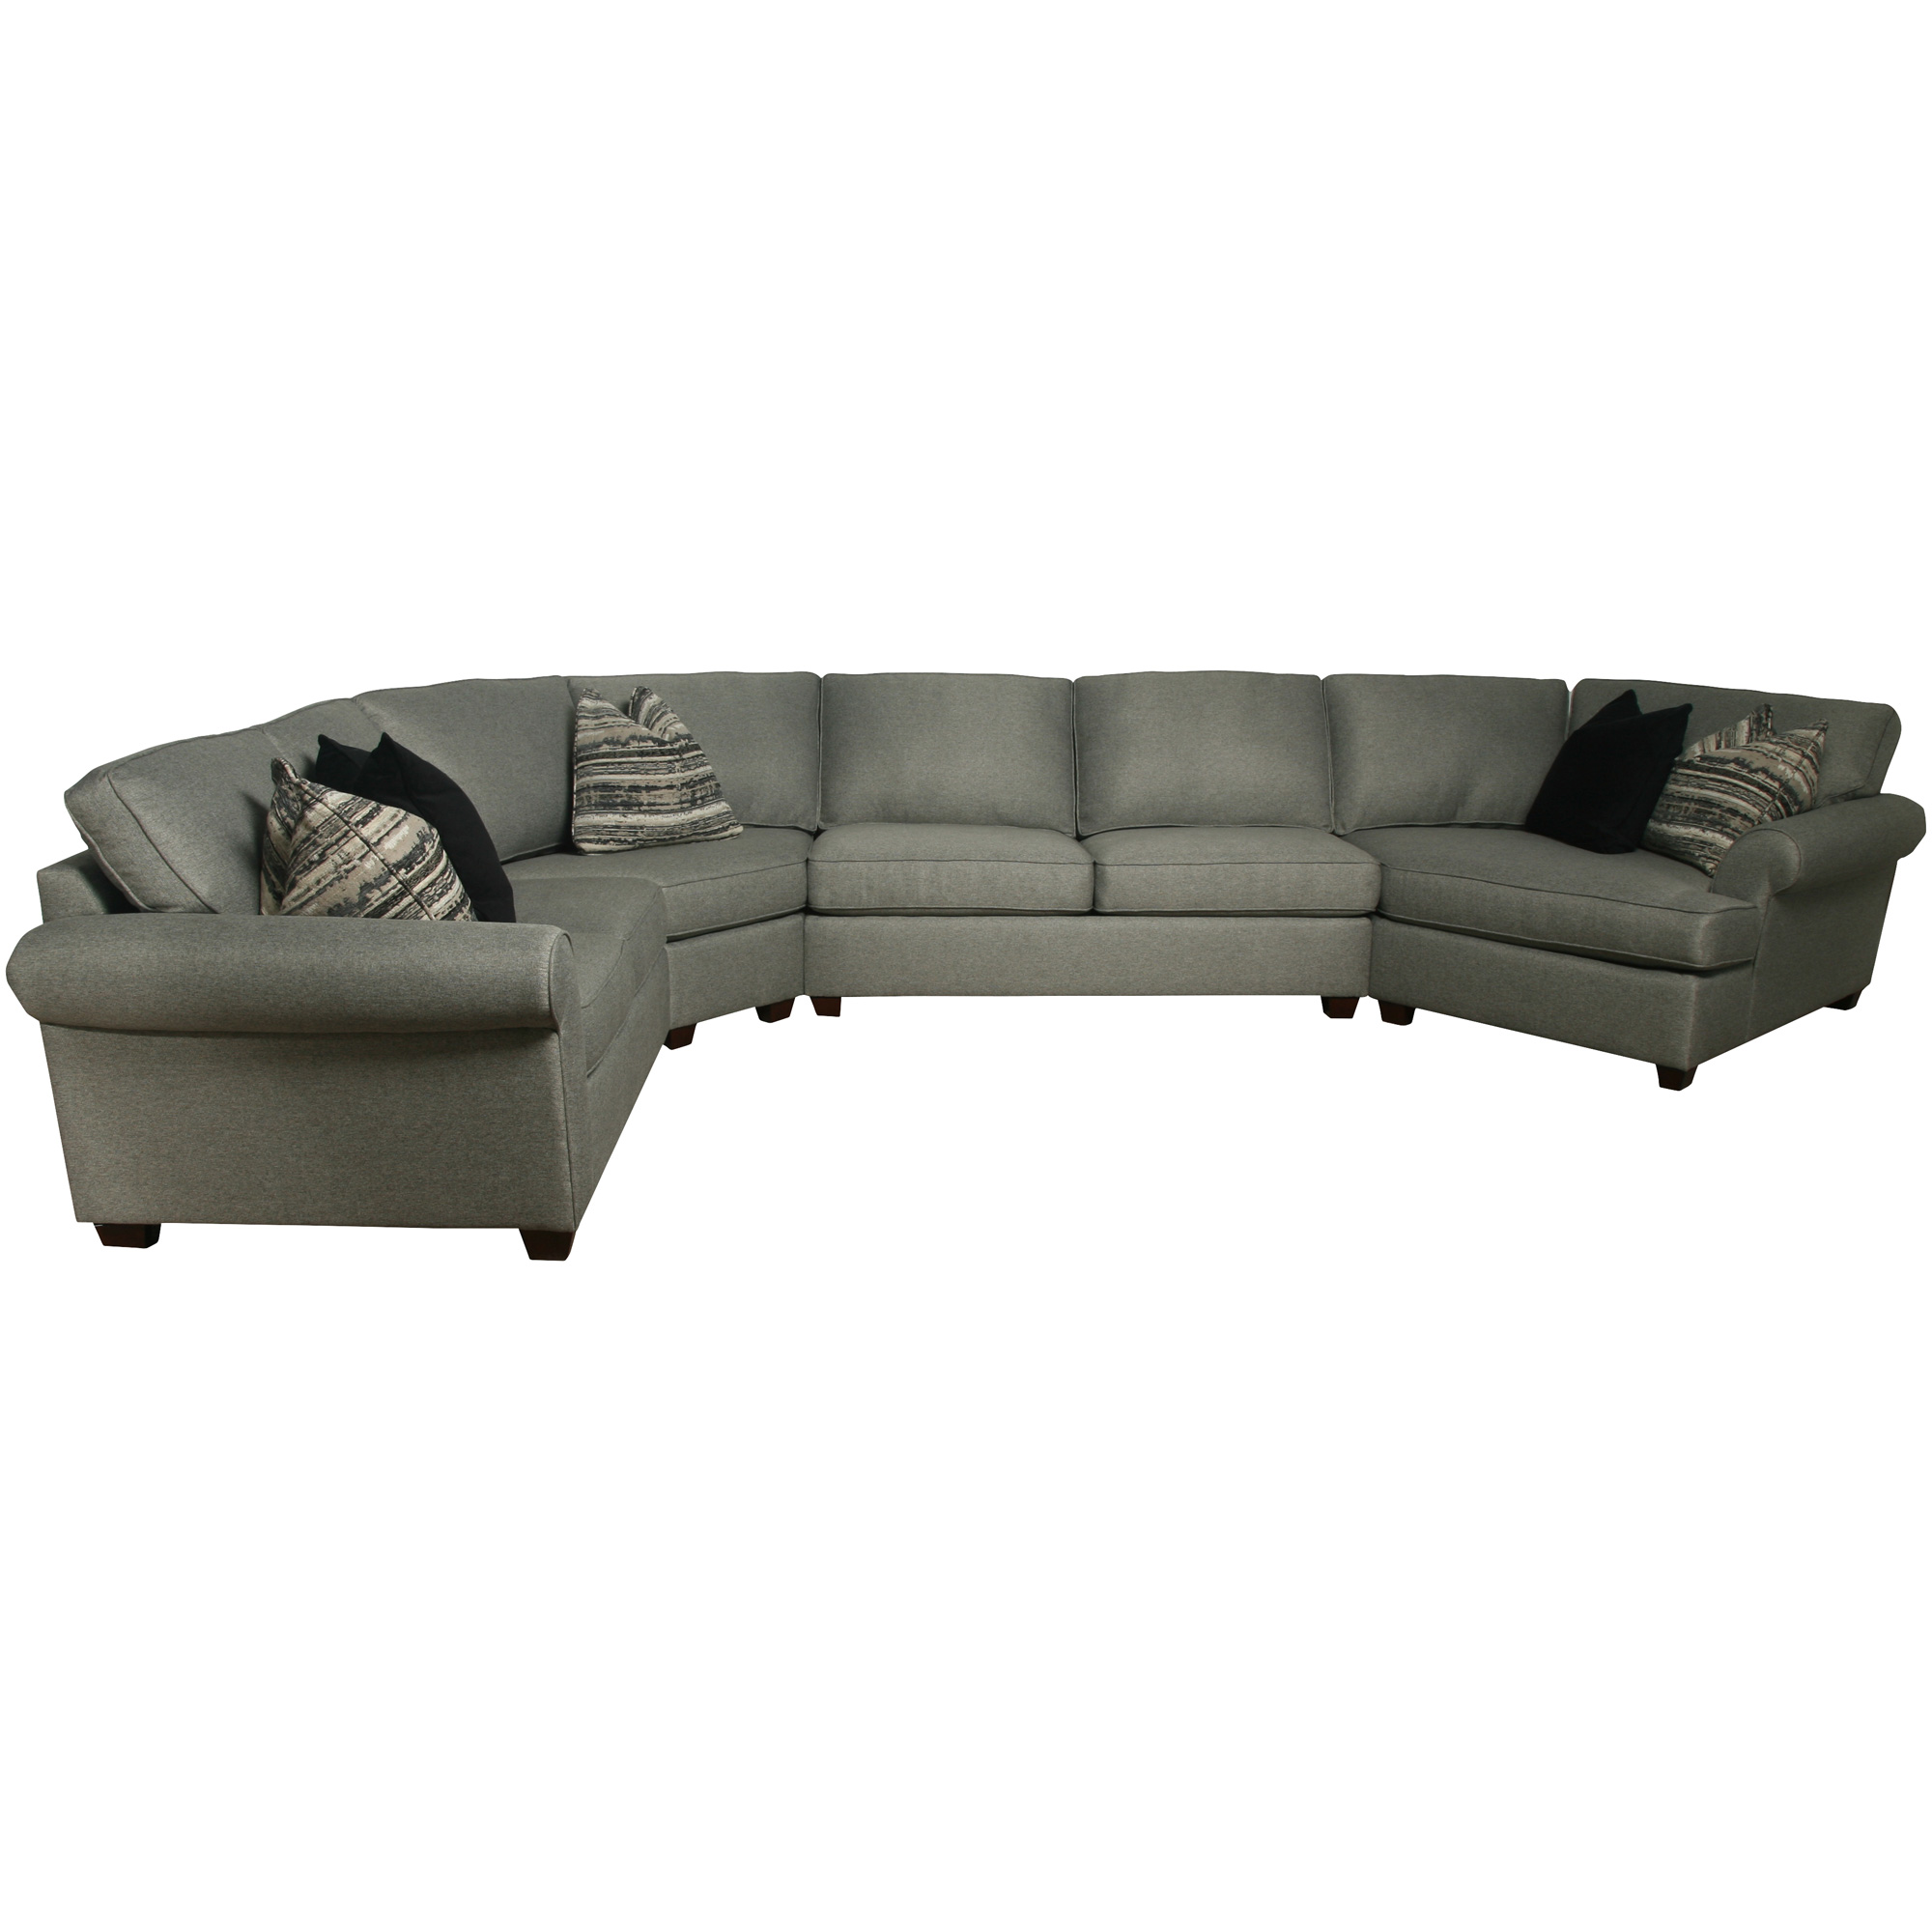 Bauhaus Furniture | Pathway Charcoal 4 Piece Right Cuddler Sectional Sofa